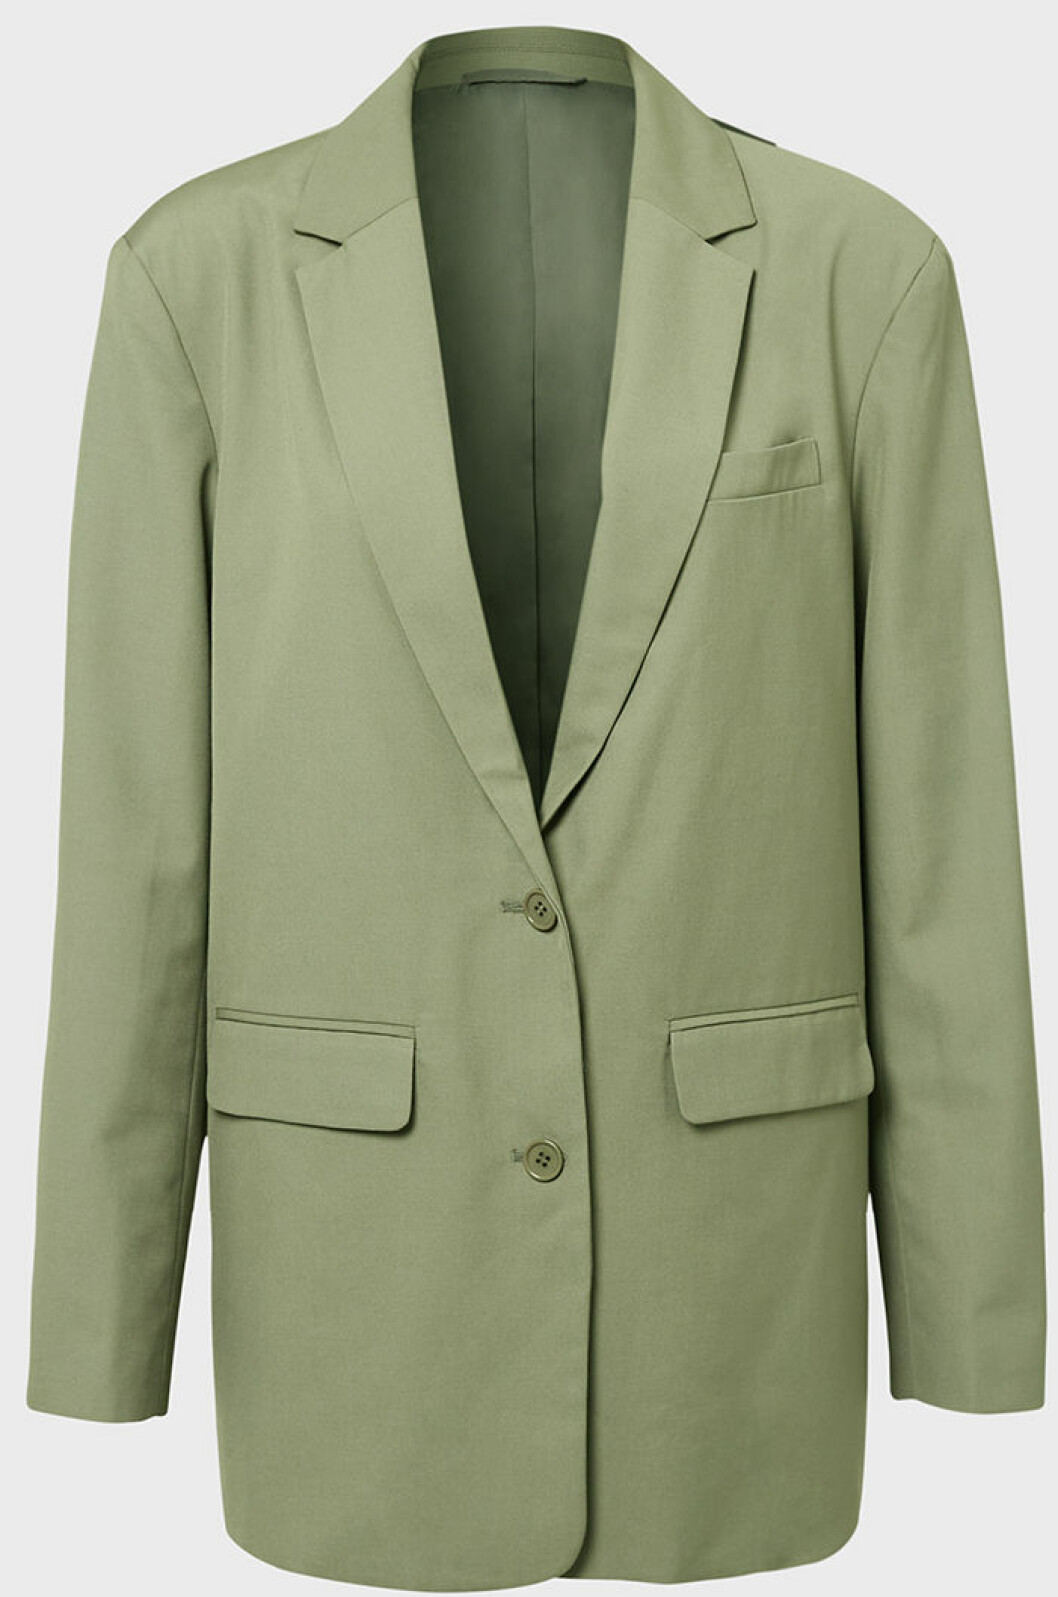 grön-kavaj-biancaxnelly